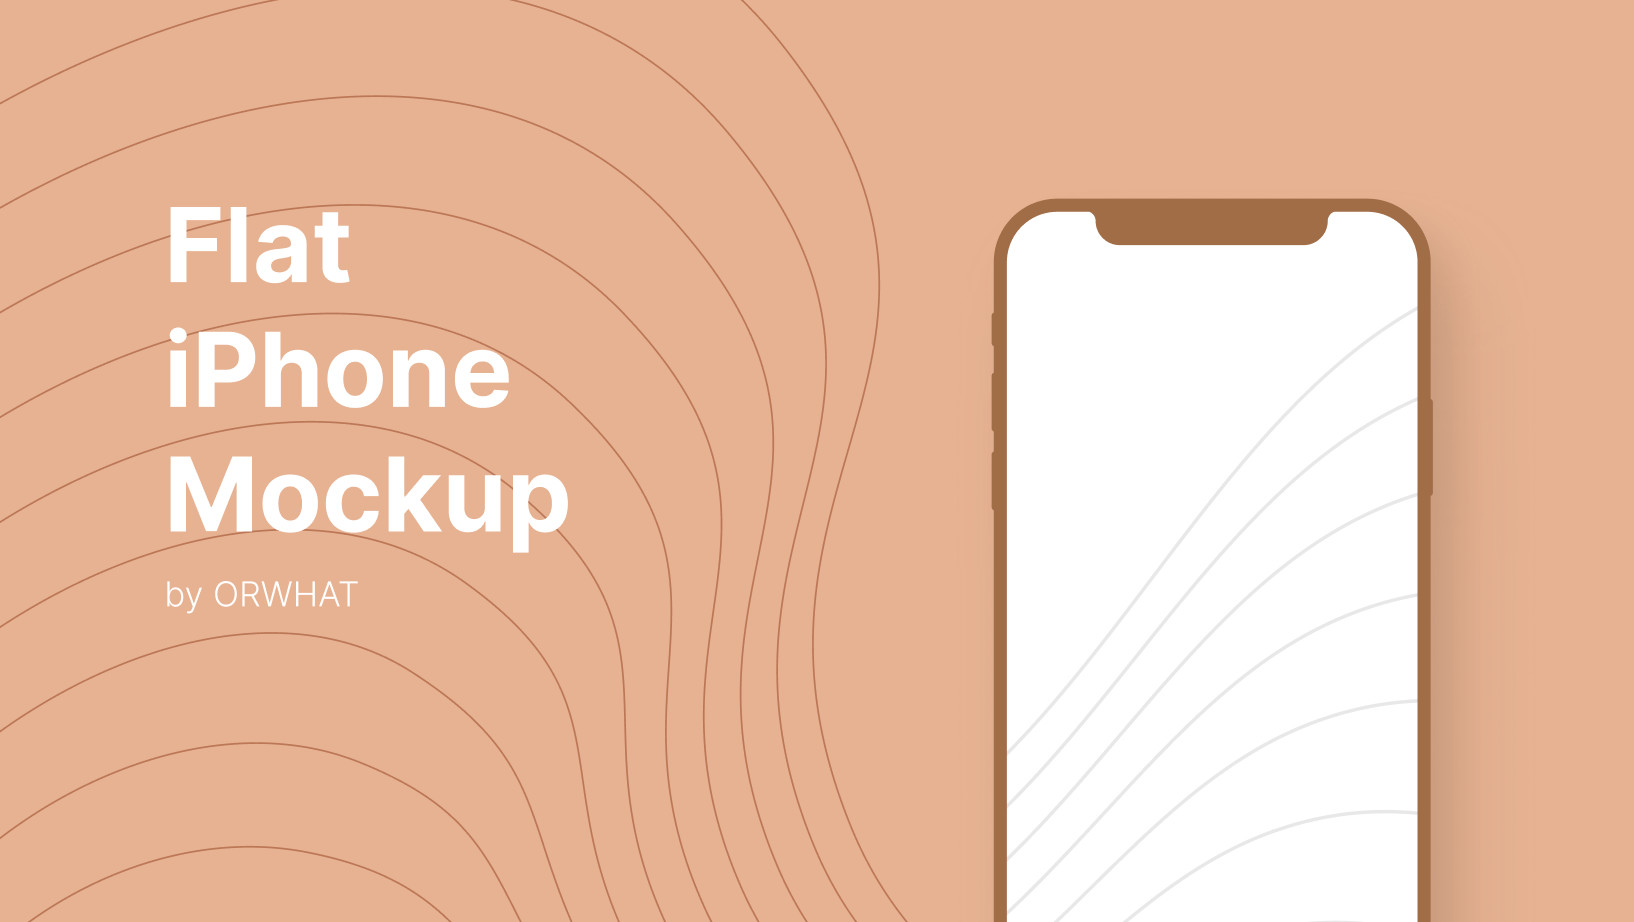 Flat iPhone Mockup for Figma